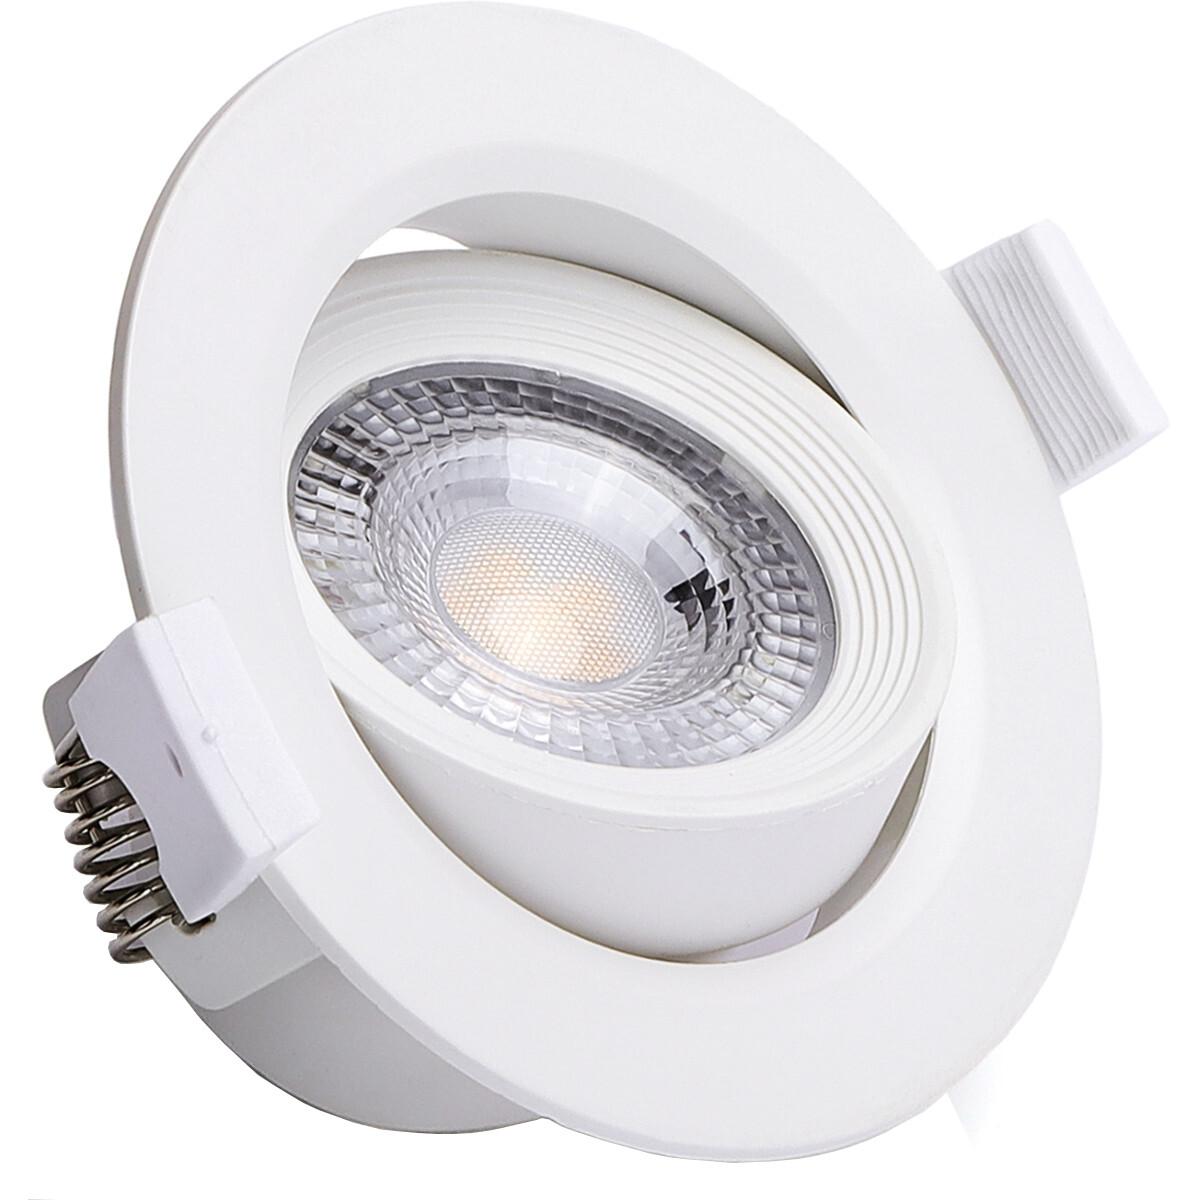 LED Spot - Inbouwspot - Aigi Nilona - 5W - Natuurlijk Wit 4000K - Rond - Kantelbaar - Mat Wit - Alum